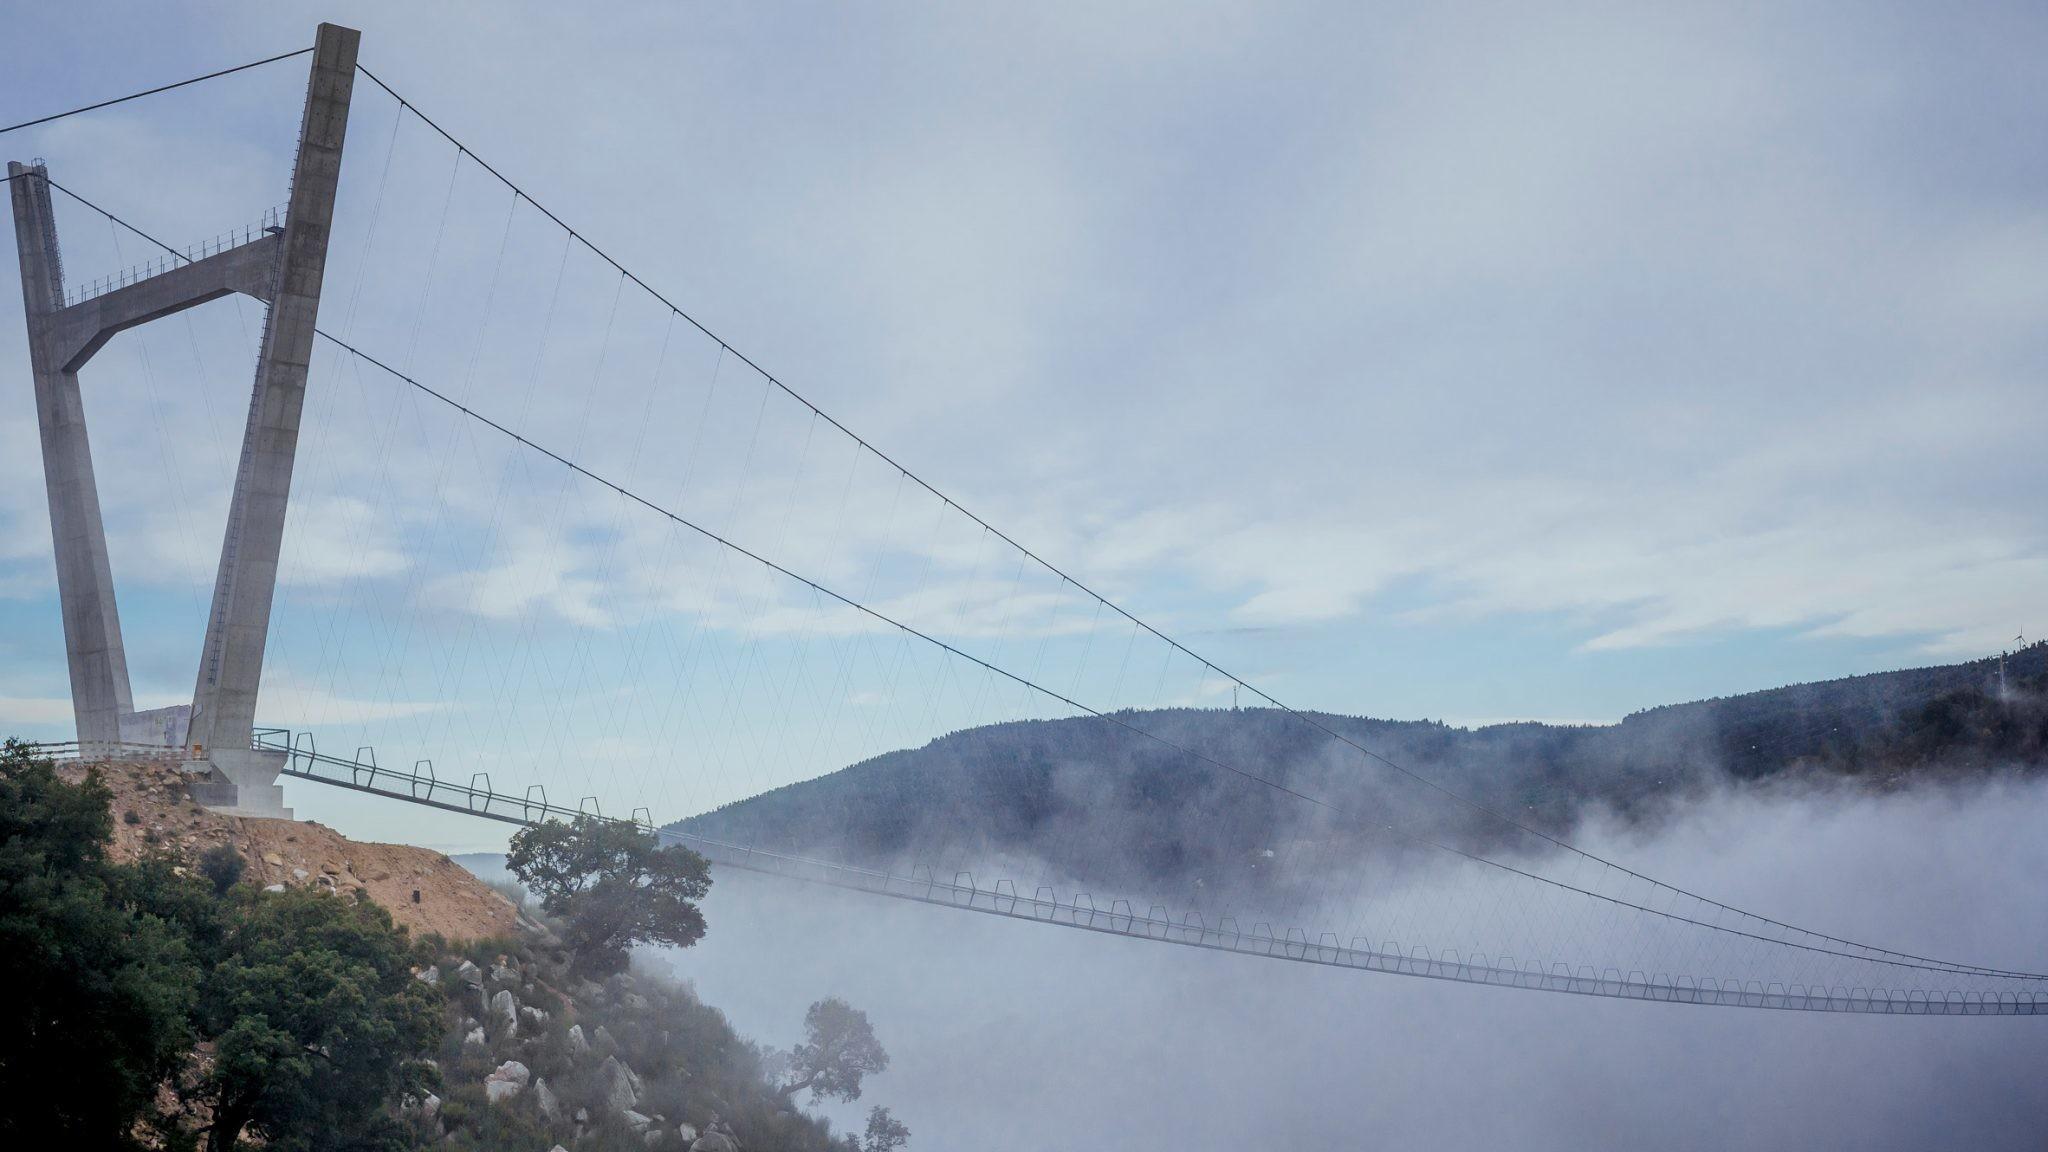 image of the Arouca bridge, northern Portugal